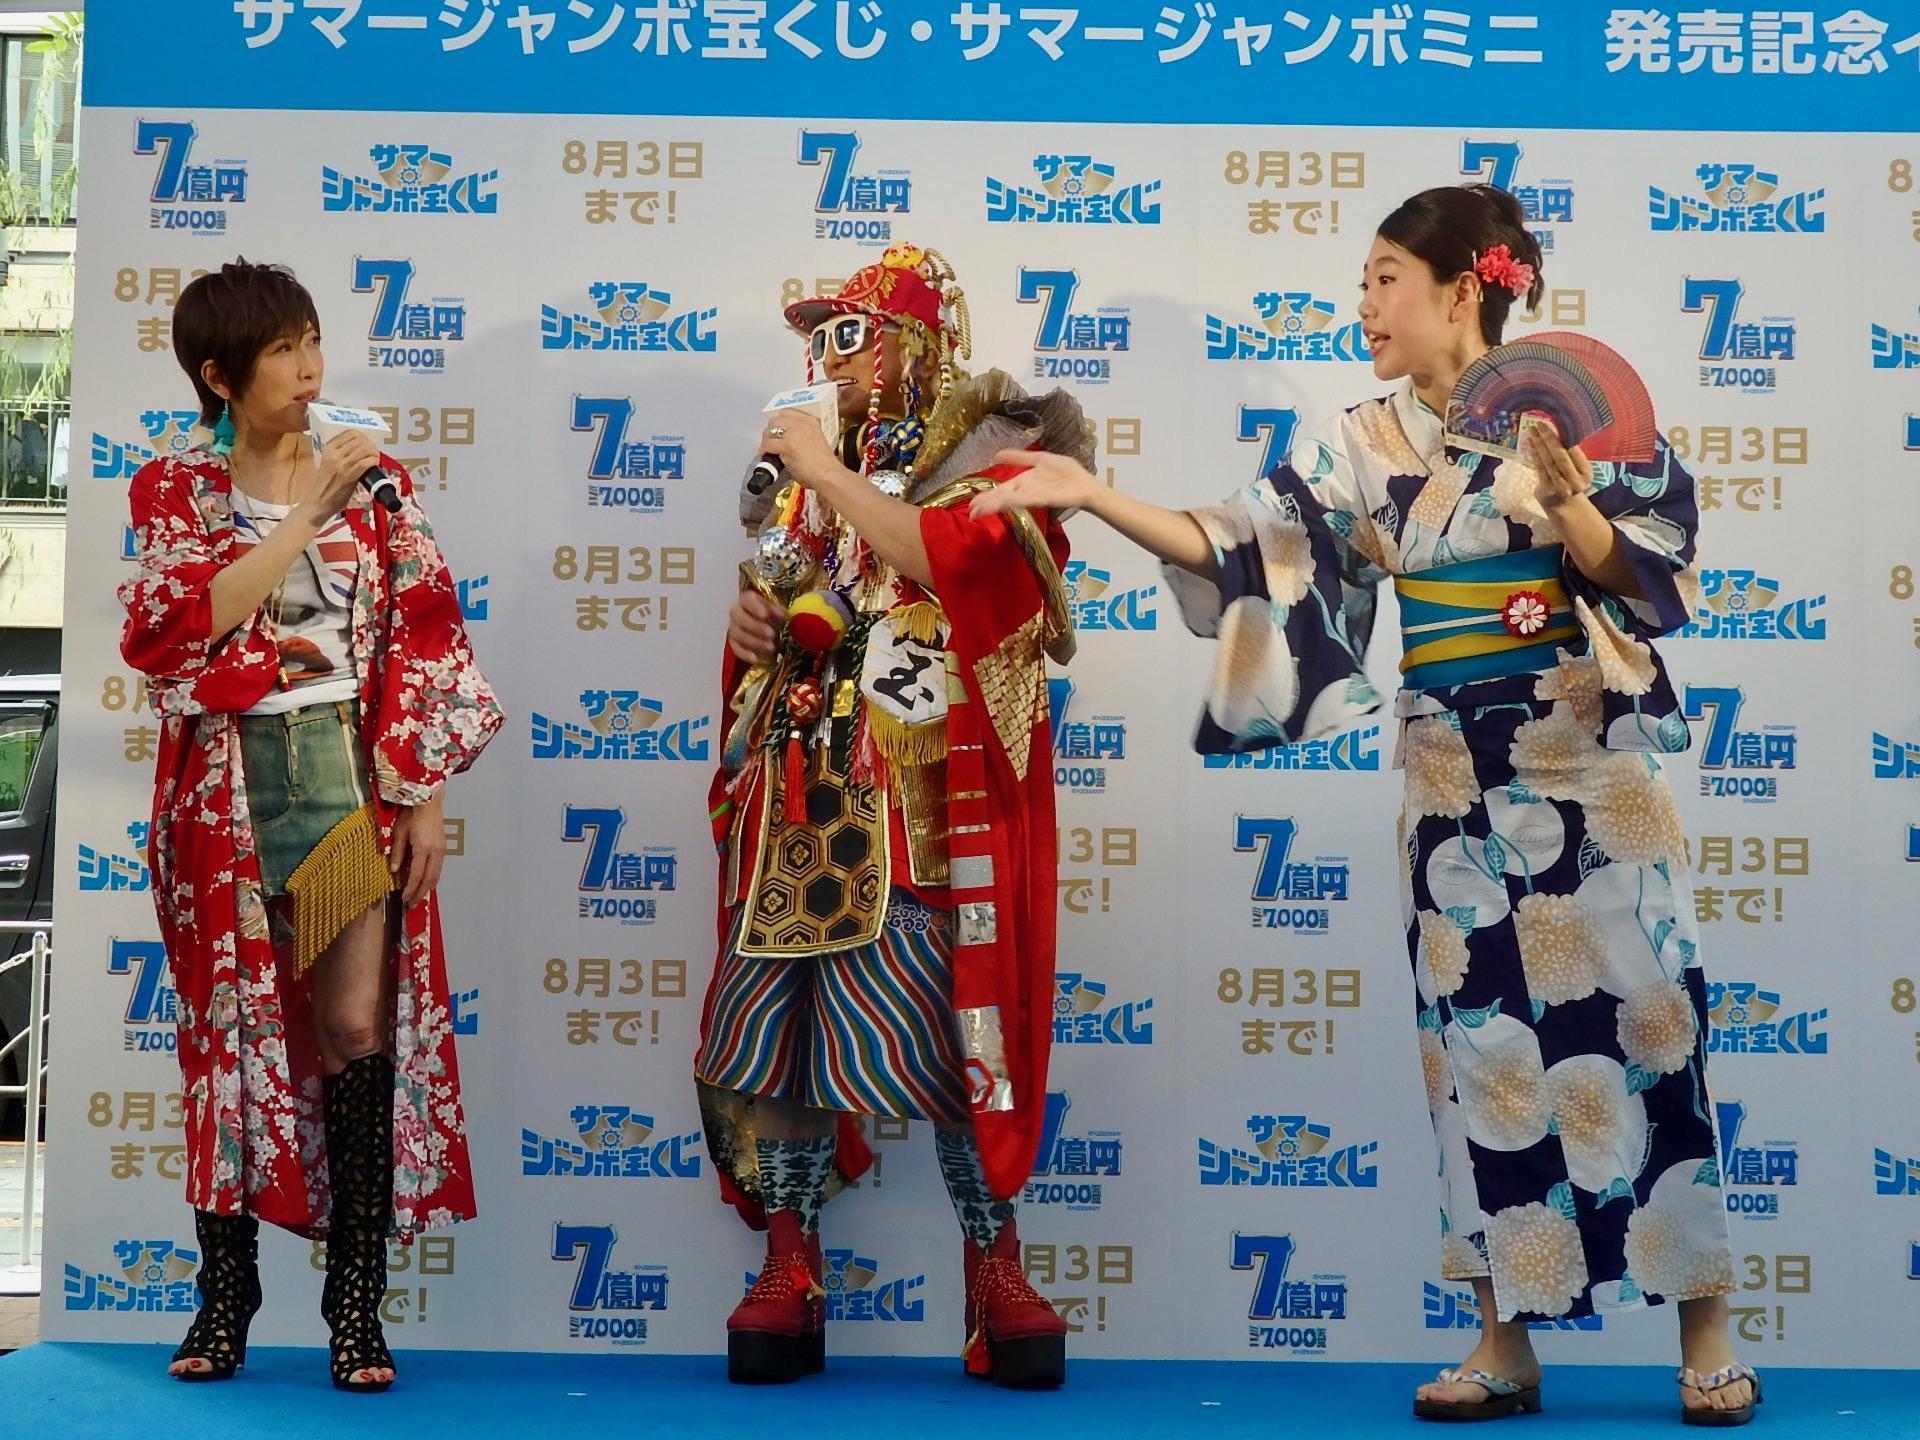 http://news.yoshimoto.co.jp/20180709203512-1e272971afee9a32d6d07a31b5fb5fde8abc10ca.jpg